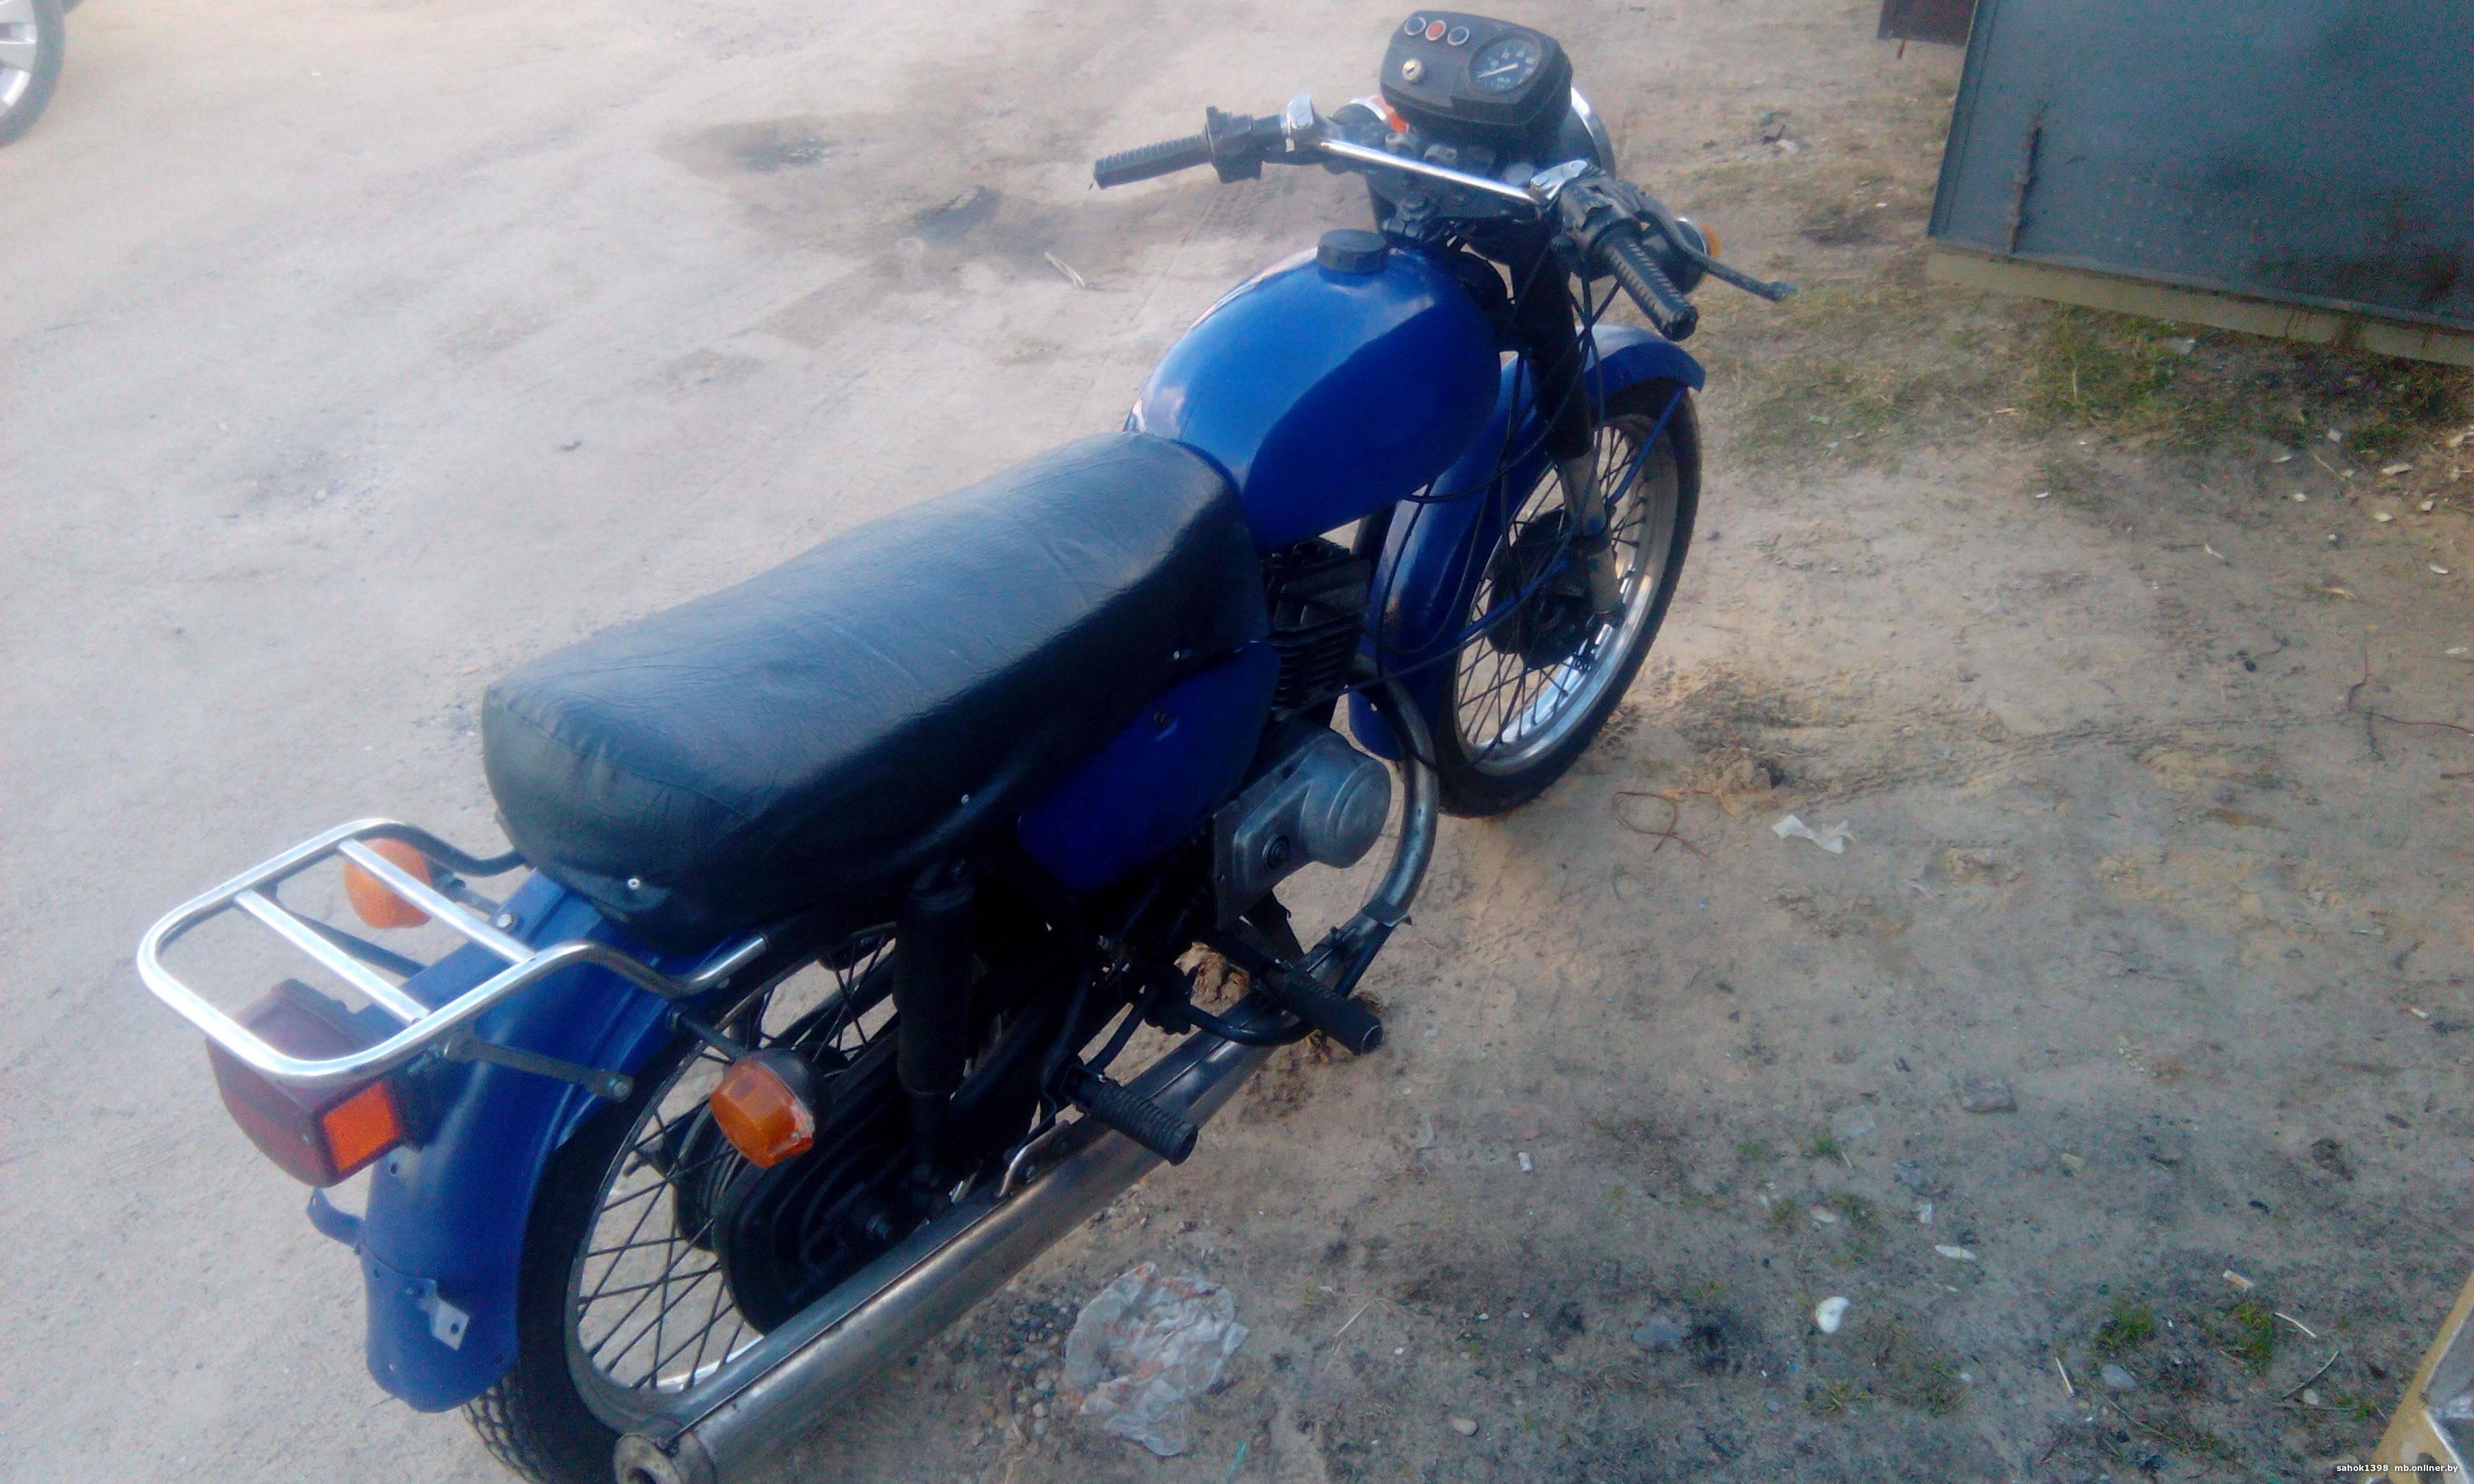 сути, сад мотоцикл минск 1993 года компания поможет